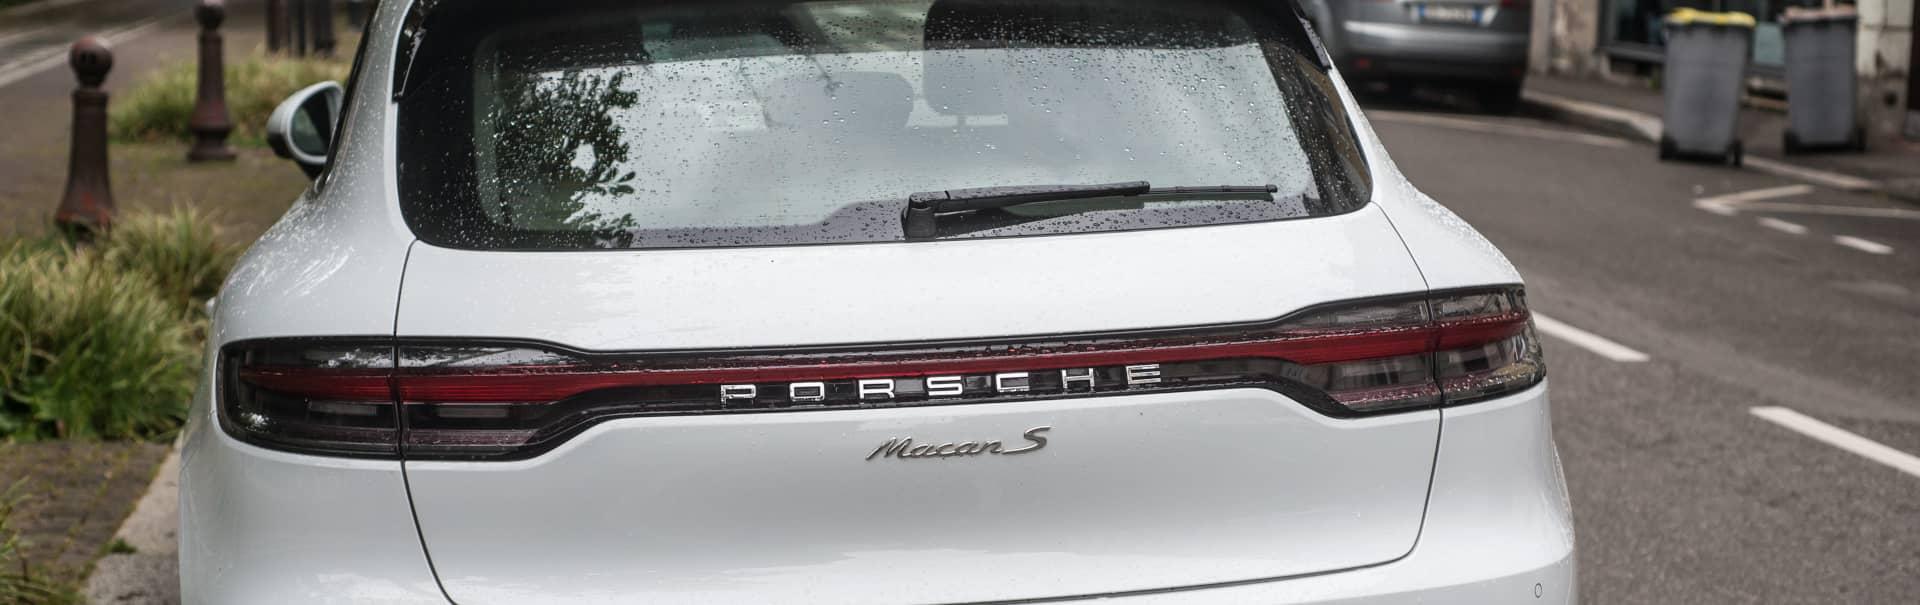 Audi muss hohen Schadensersatz an Porsche-Halter zahlen